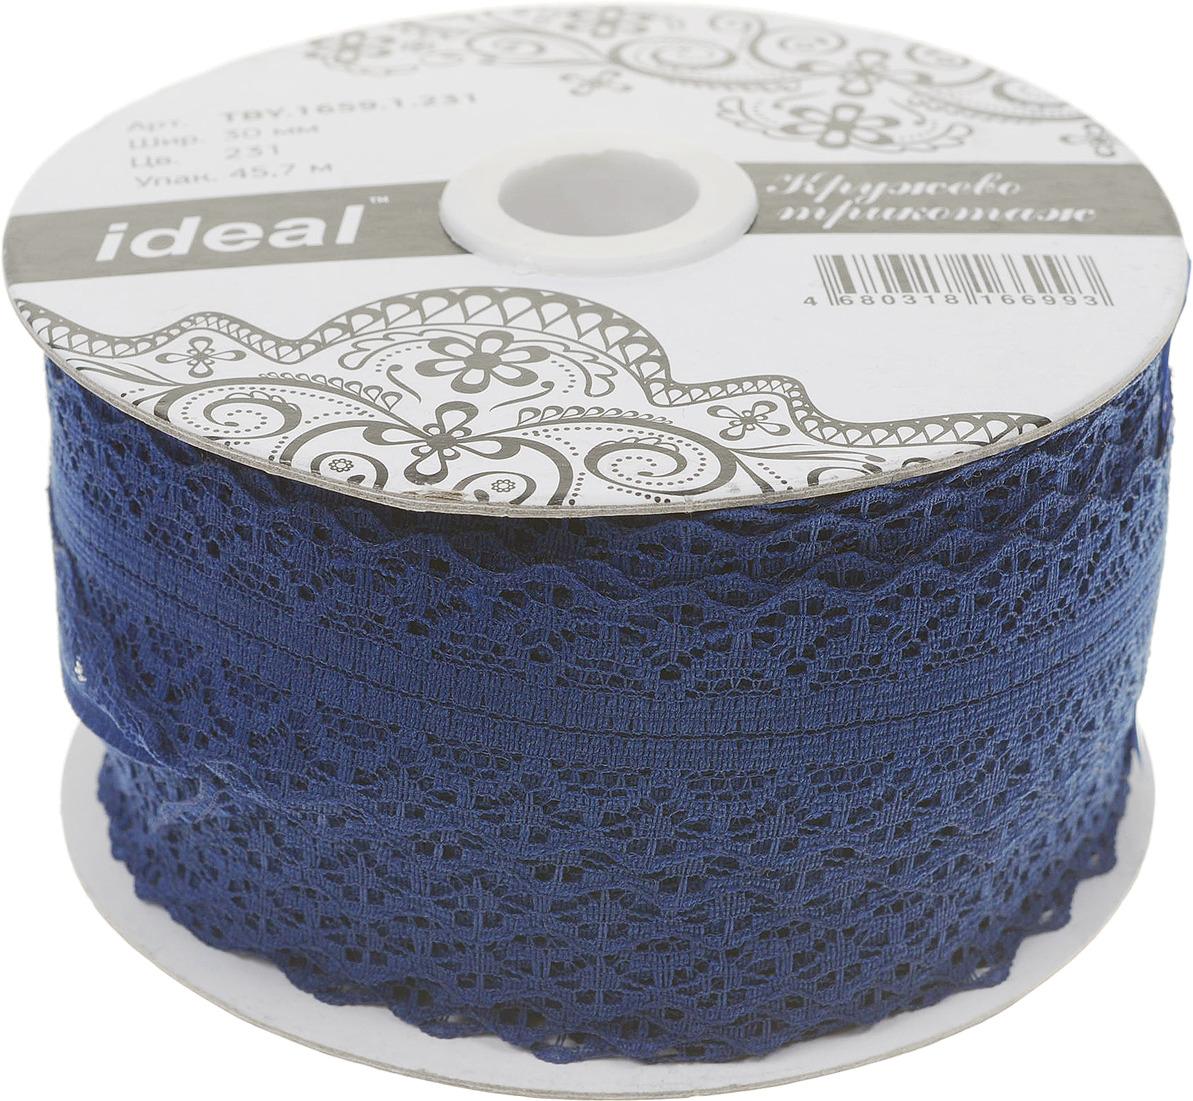 Фото - Тесьма IDEAL кружевная, темно-синий, 3 см, 45,7 м тесьма ideal кружевная персиковый 4 см 45 7 м